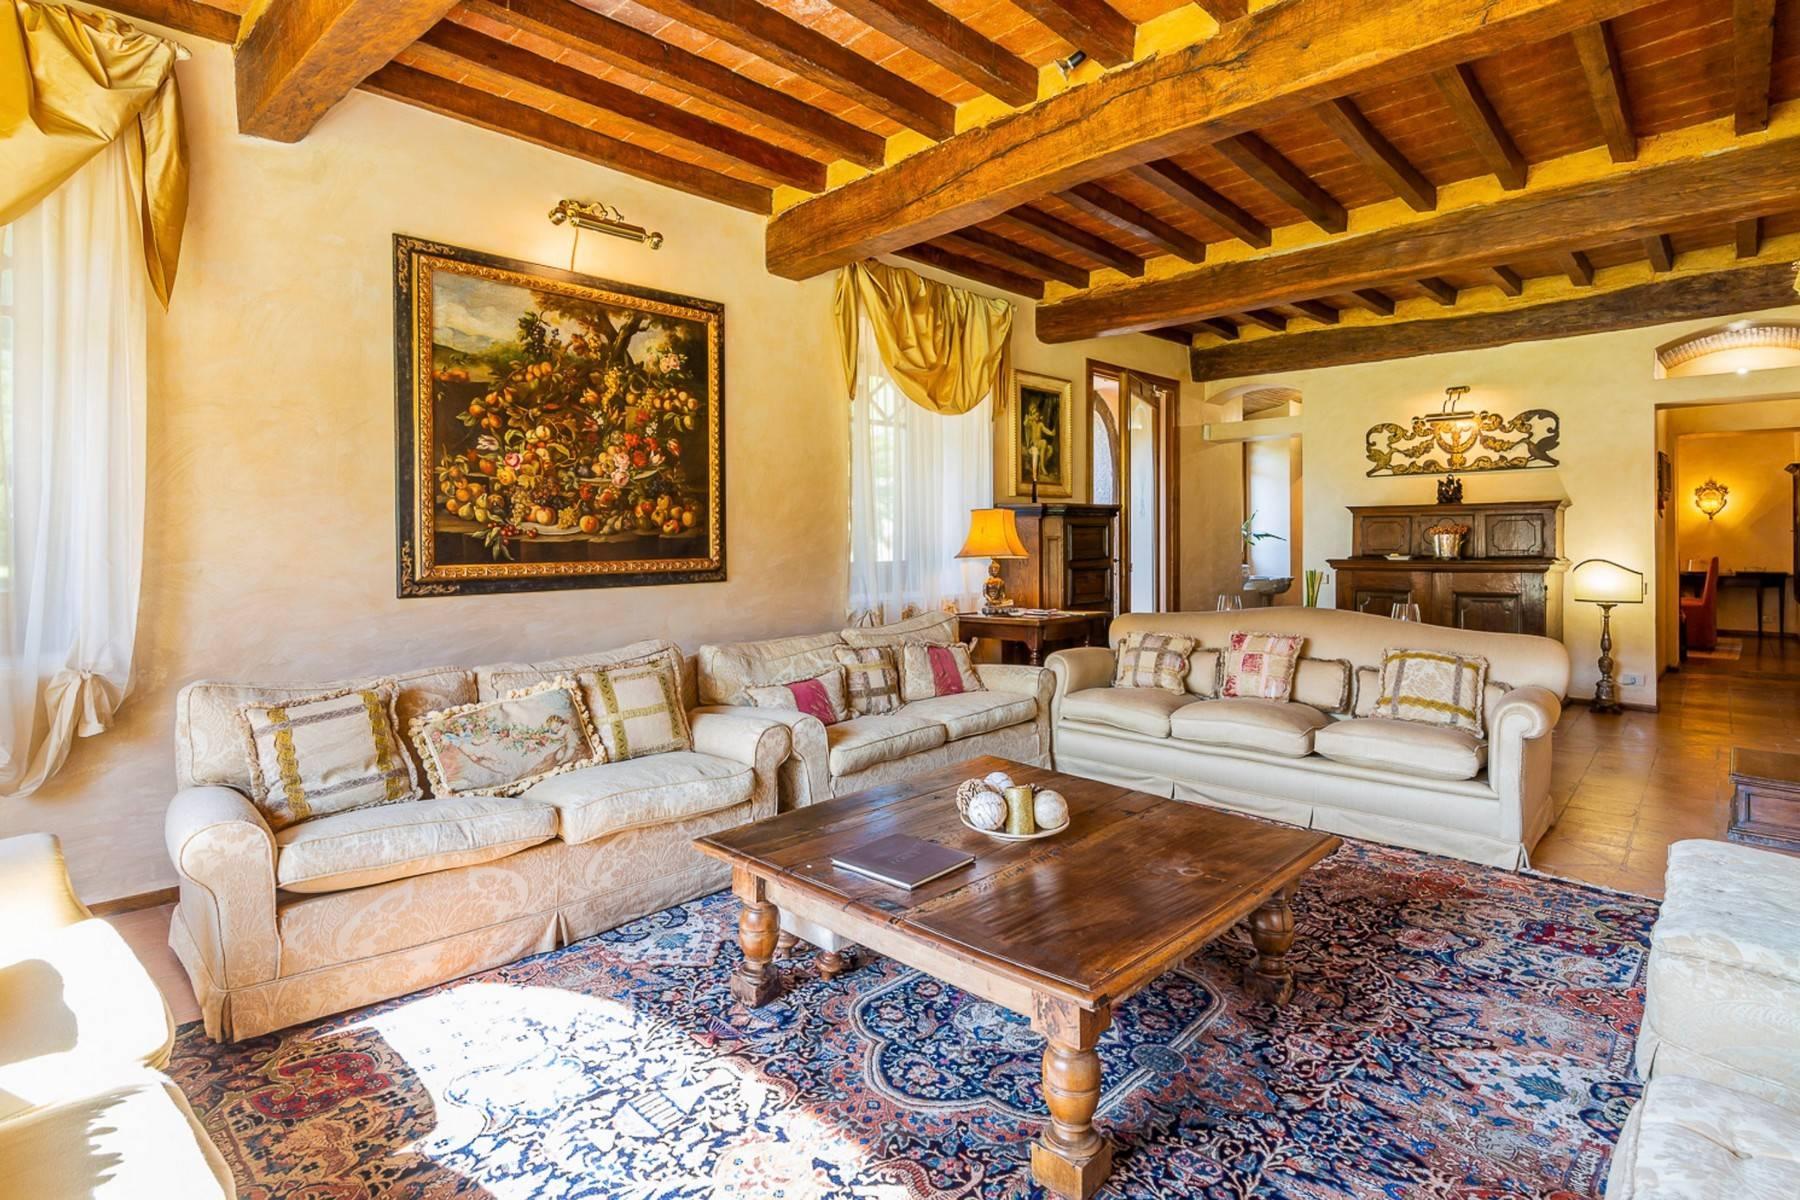 Villa in Vendita a Lucca: 5 locali, 1130 mq - Foto 7